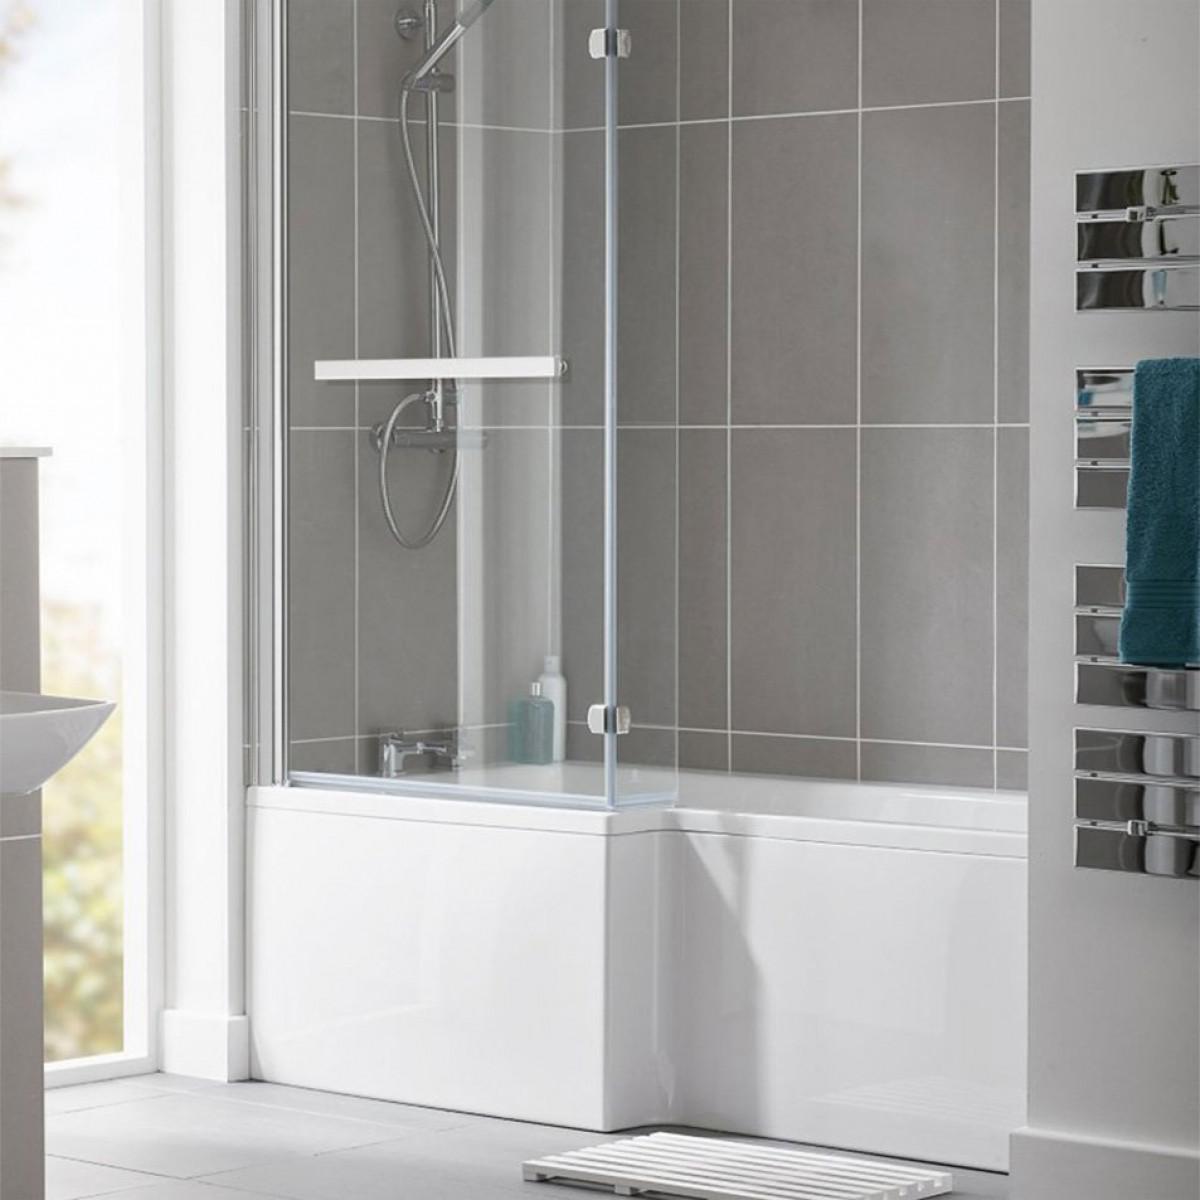 Essential Kensington 1700mm Square Shower Bath inc Bath Screen Left Hand